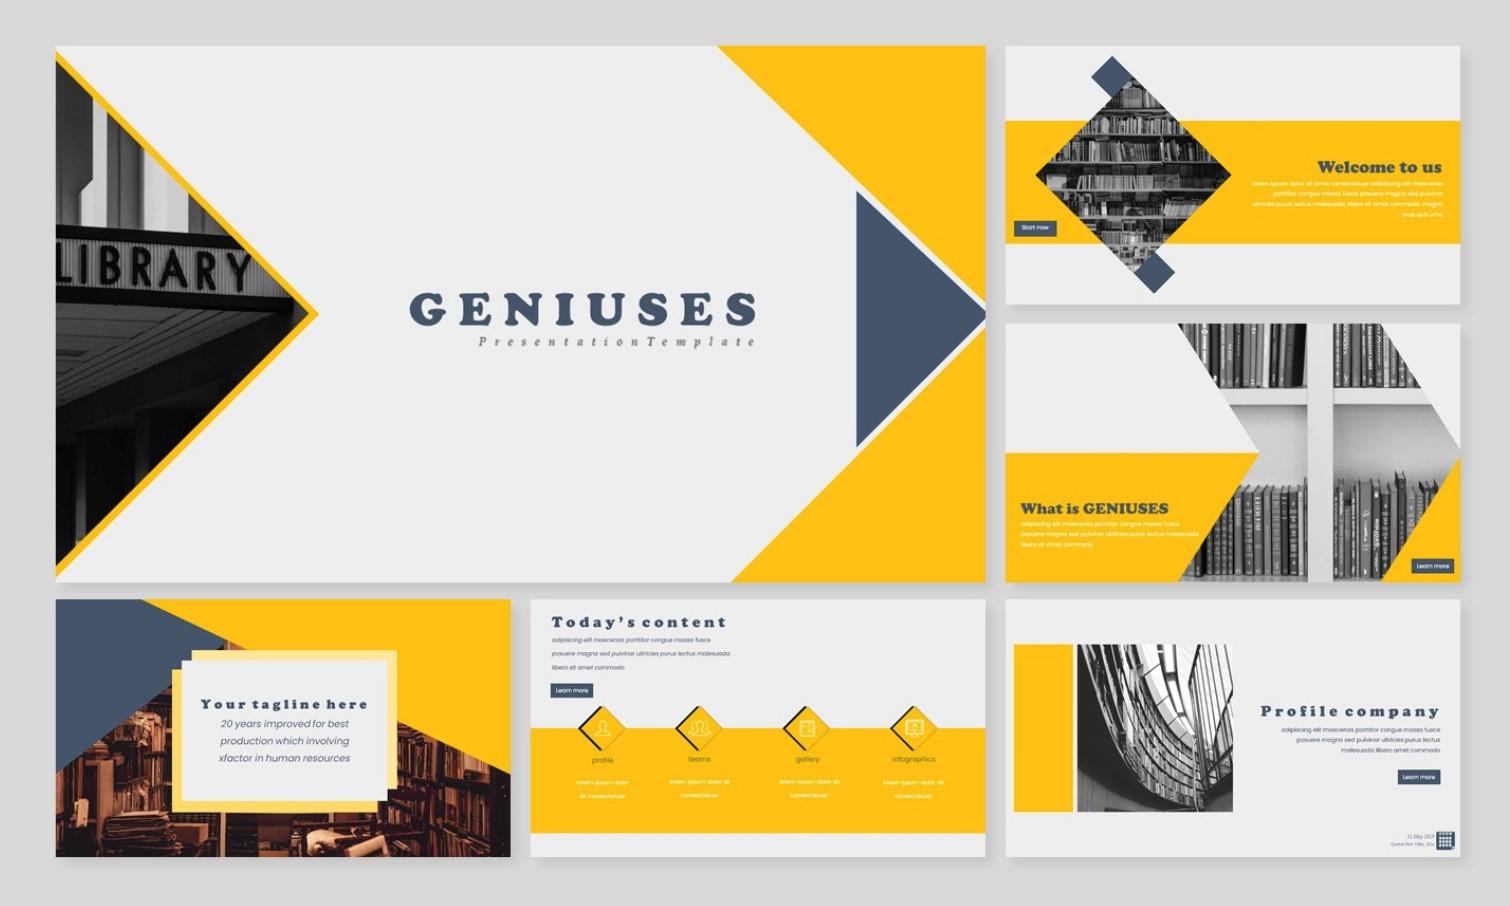 genuises creative powerpoint template